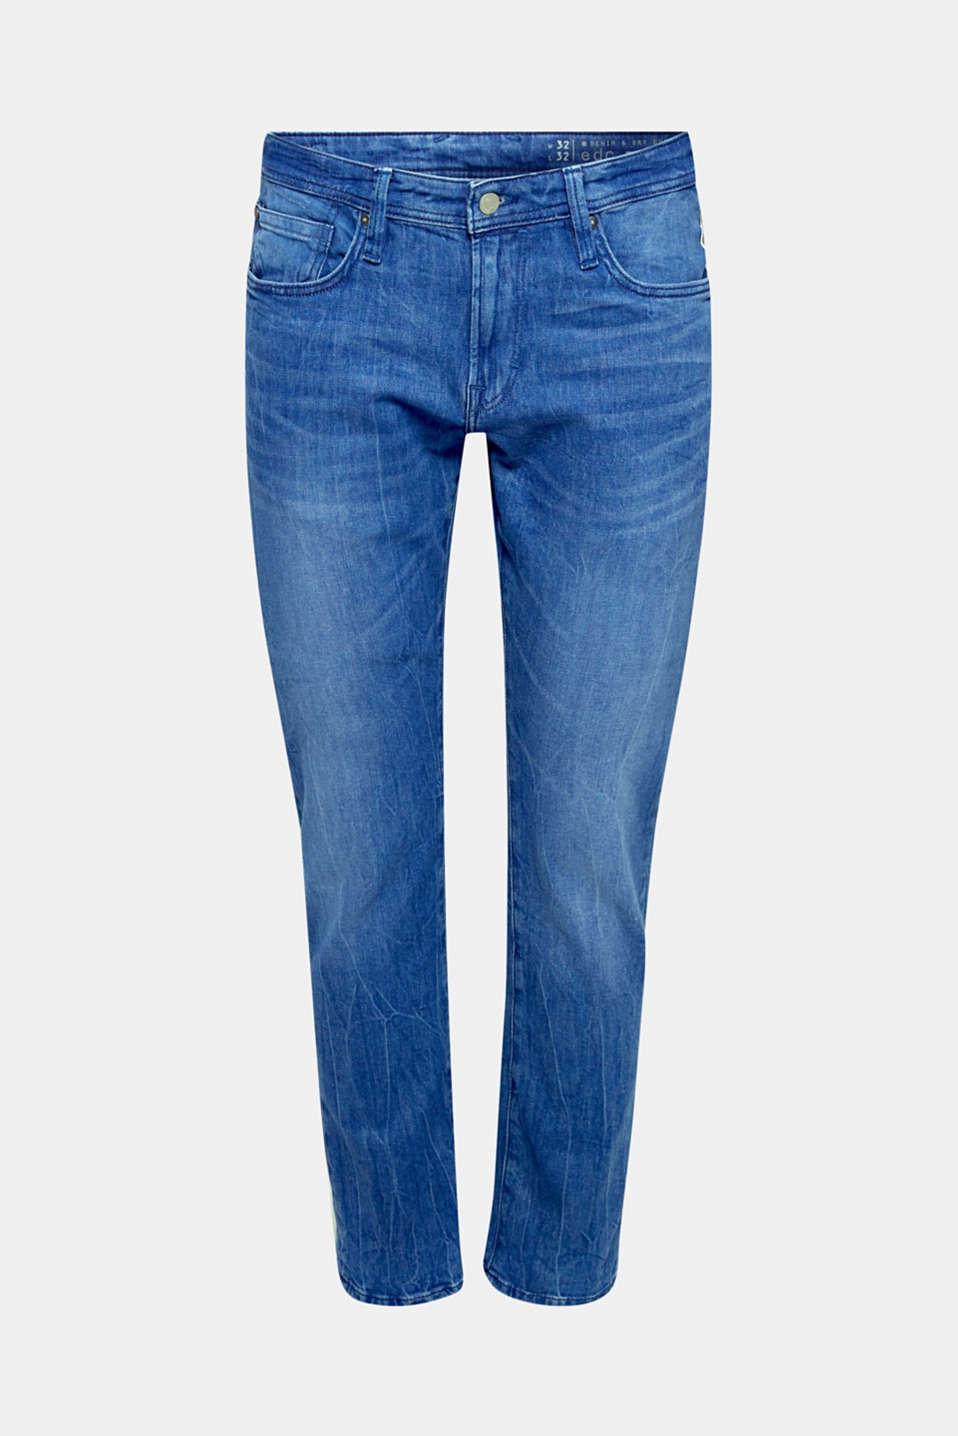 Pants denim, BRIGHT BLUE, detail image number 5